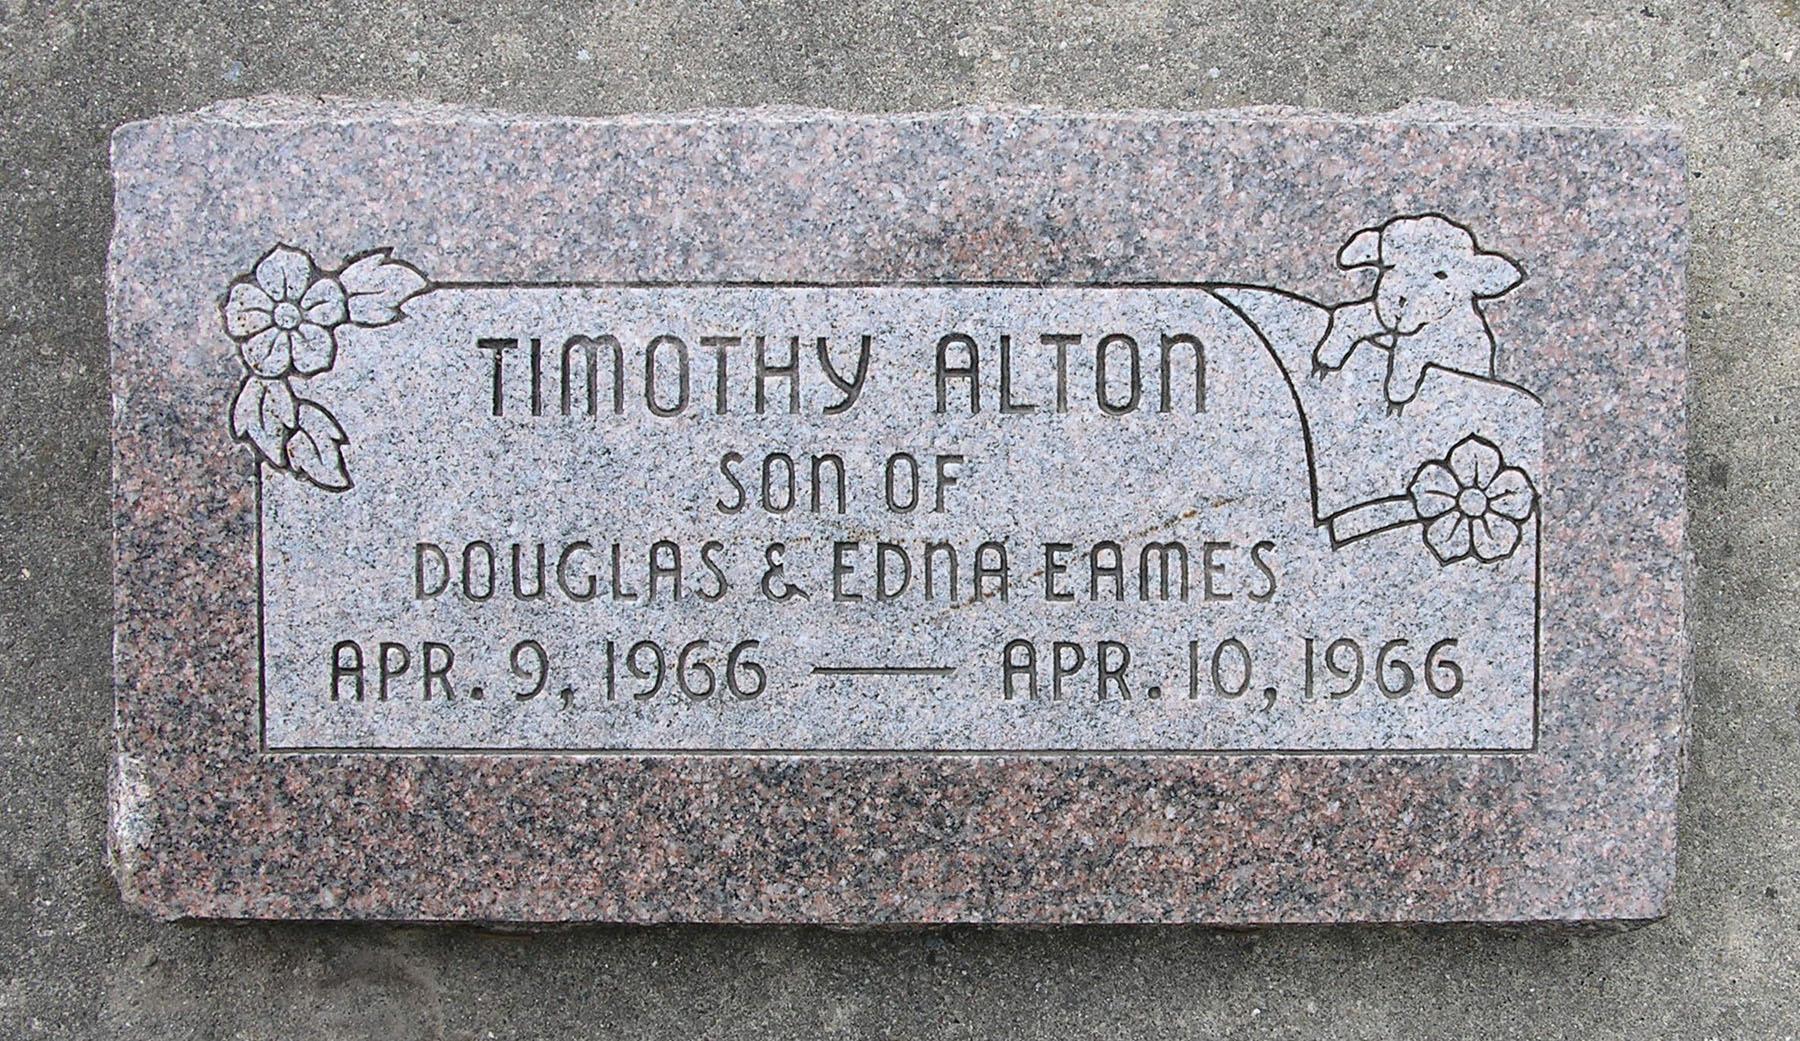 Timothy Alton Eames